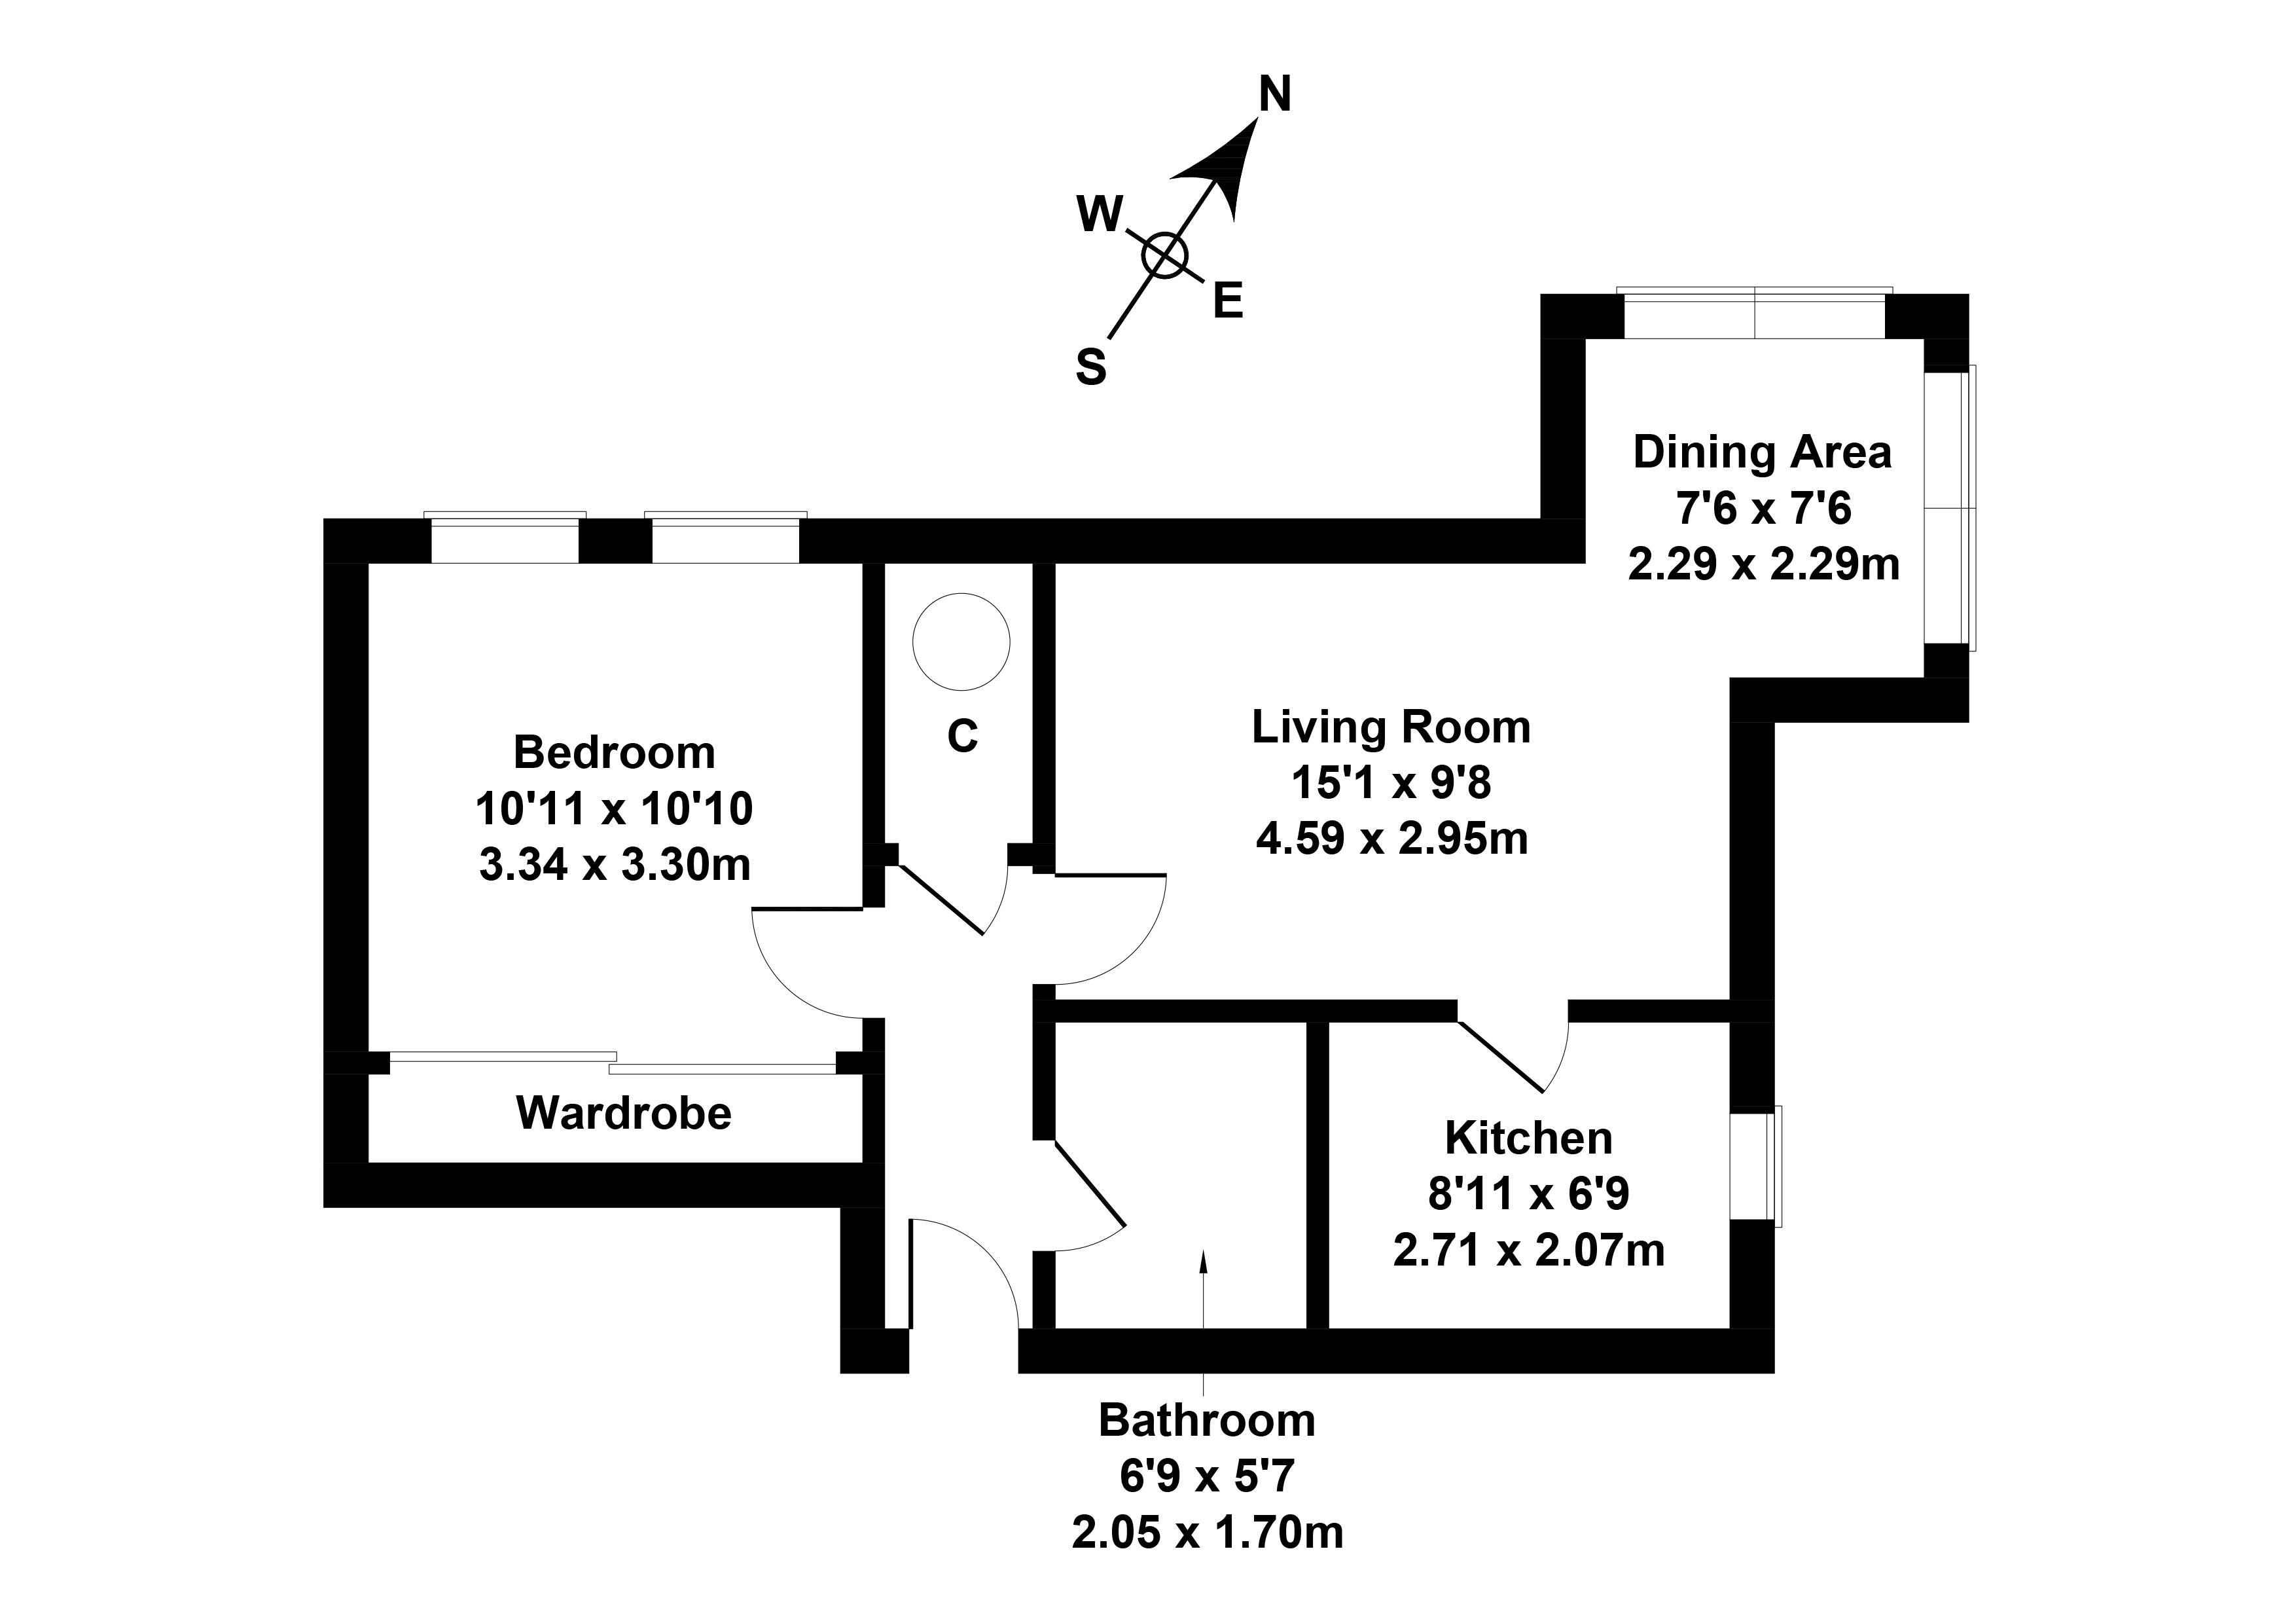 Floorplan 1 of 16/1, Balfour Place, Leith, Edinburgh, EH6 5DW